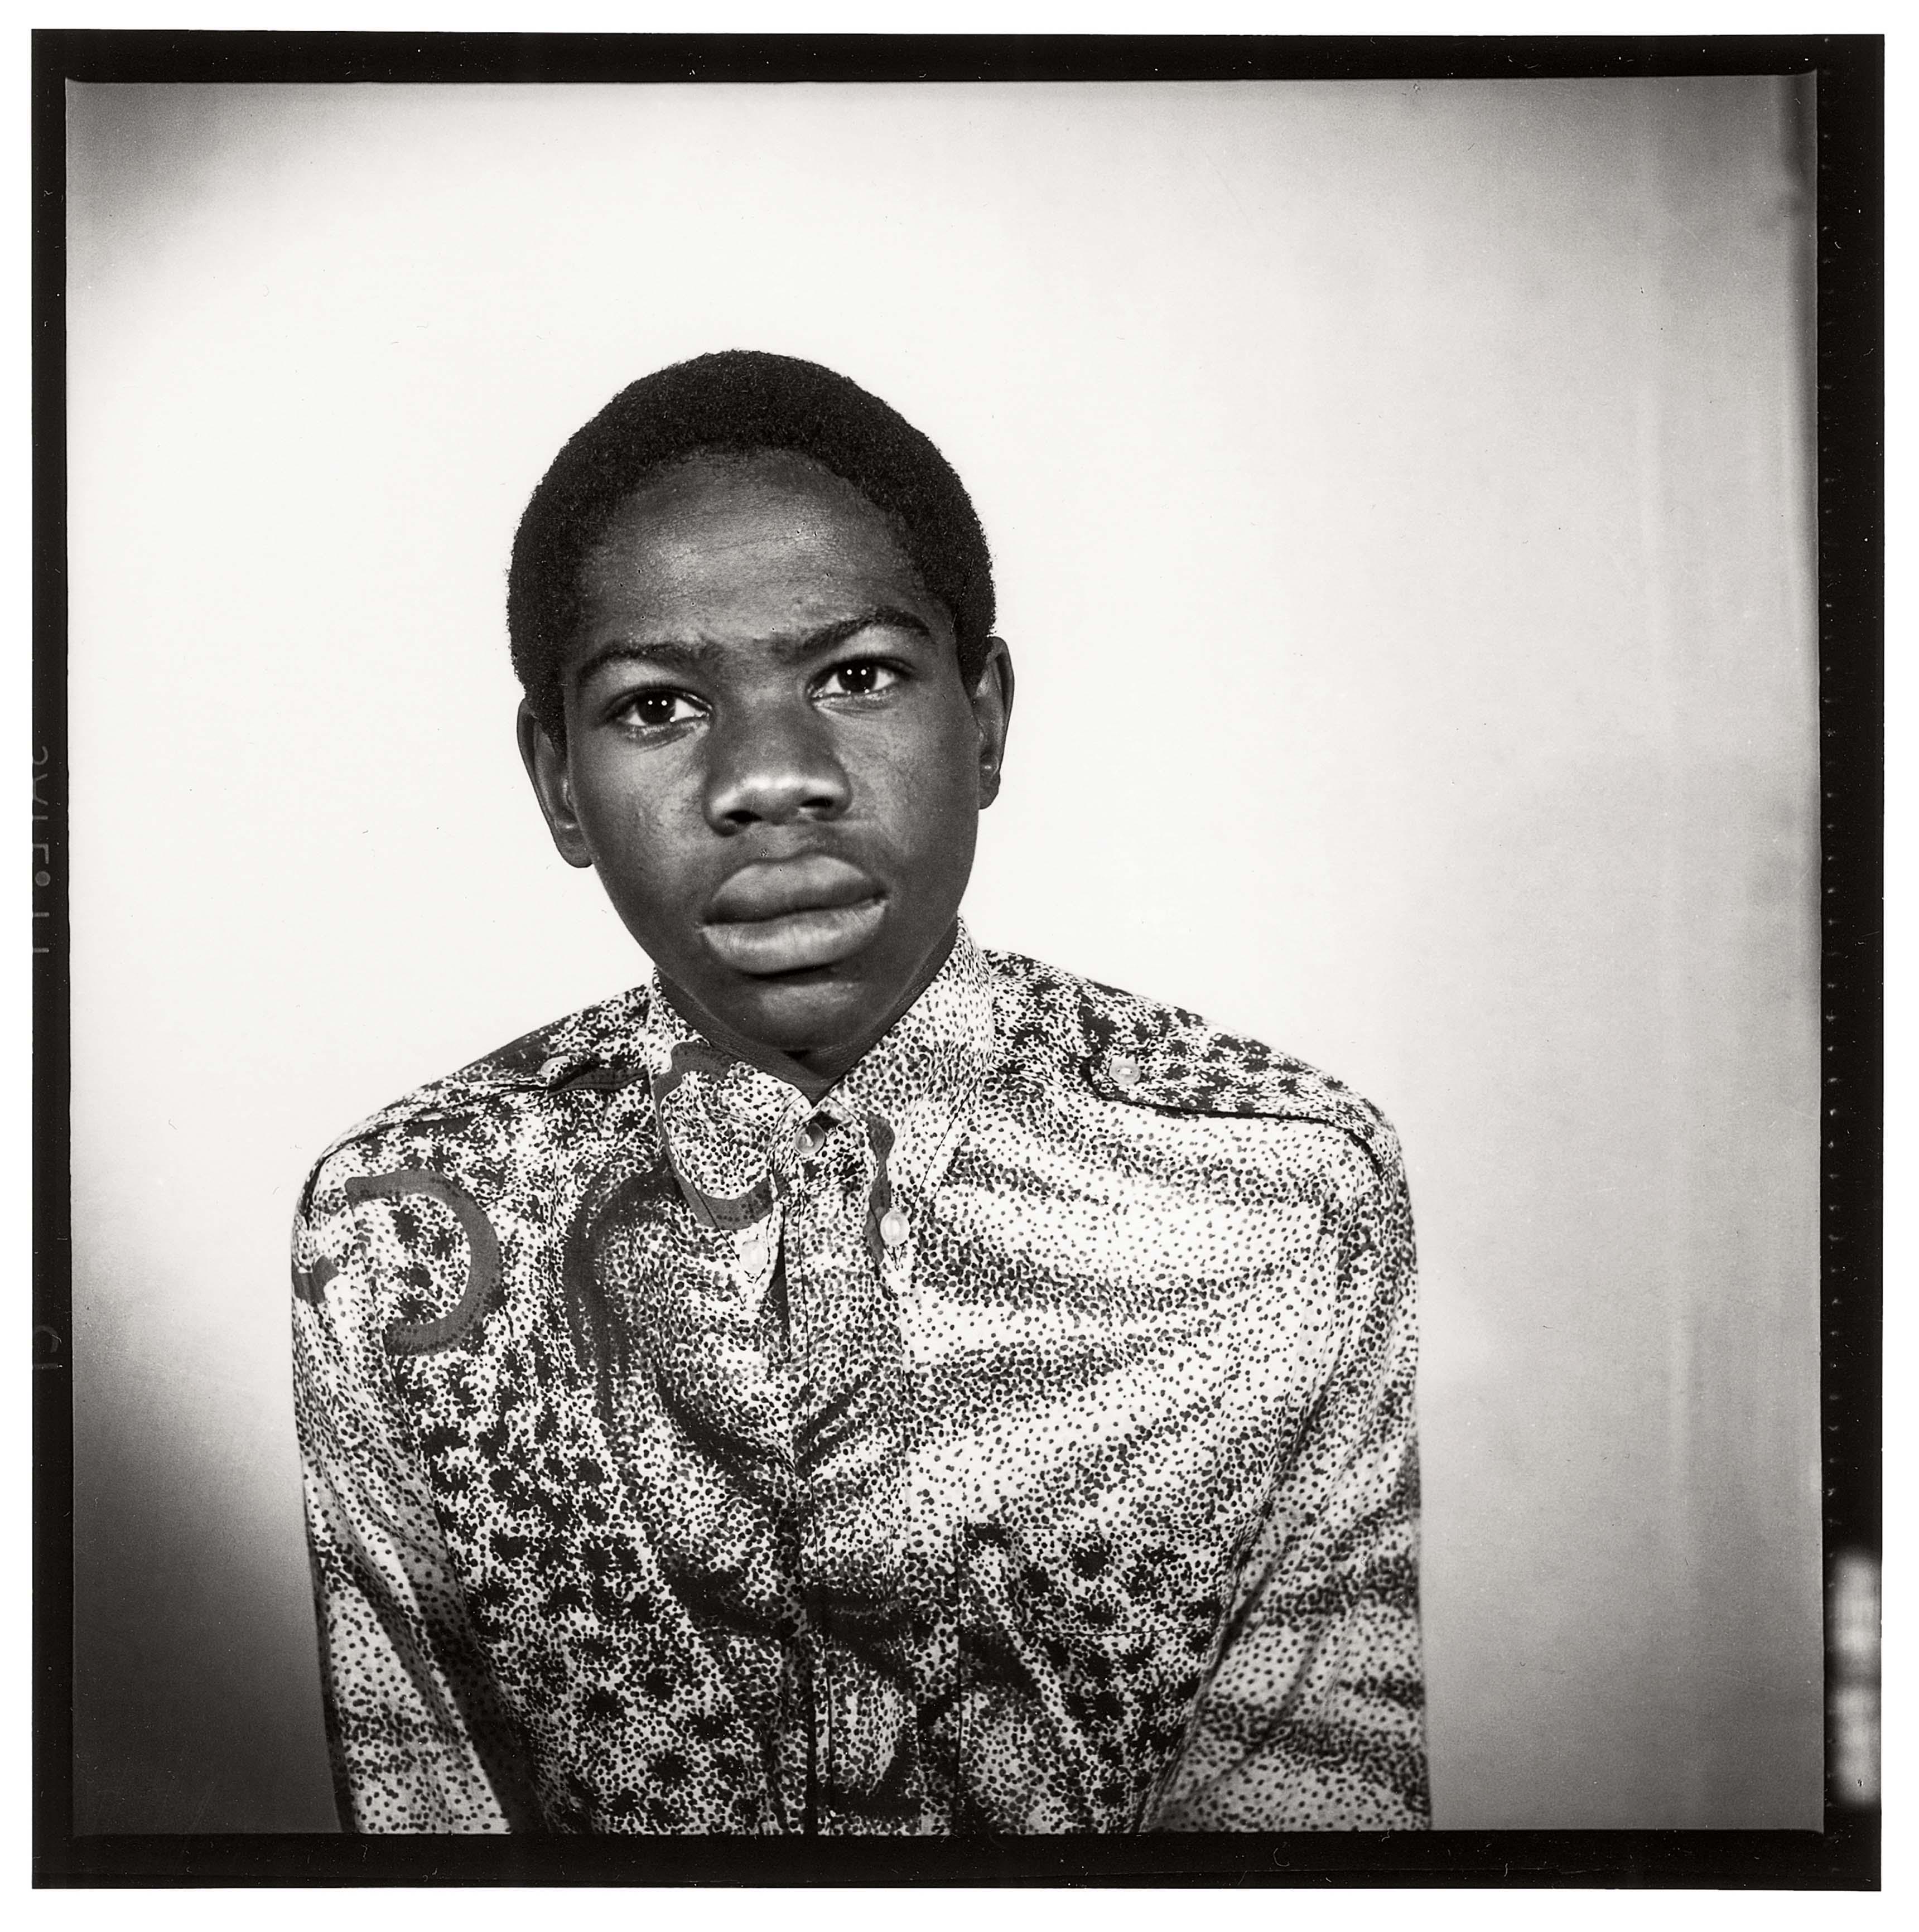 Malick Sidibé, 1968 Tirage gélatino-argentique 120 x 120 cm Courtesy Galerie MAGNIN-A, Paris © Malick Sidibé